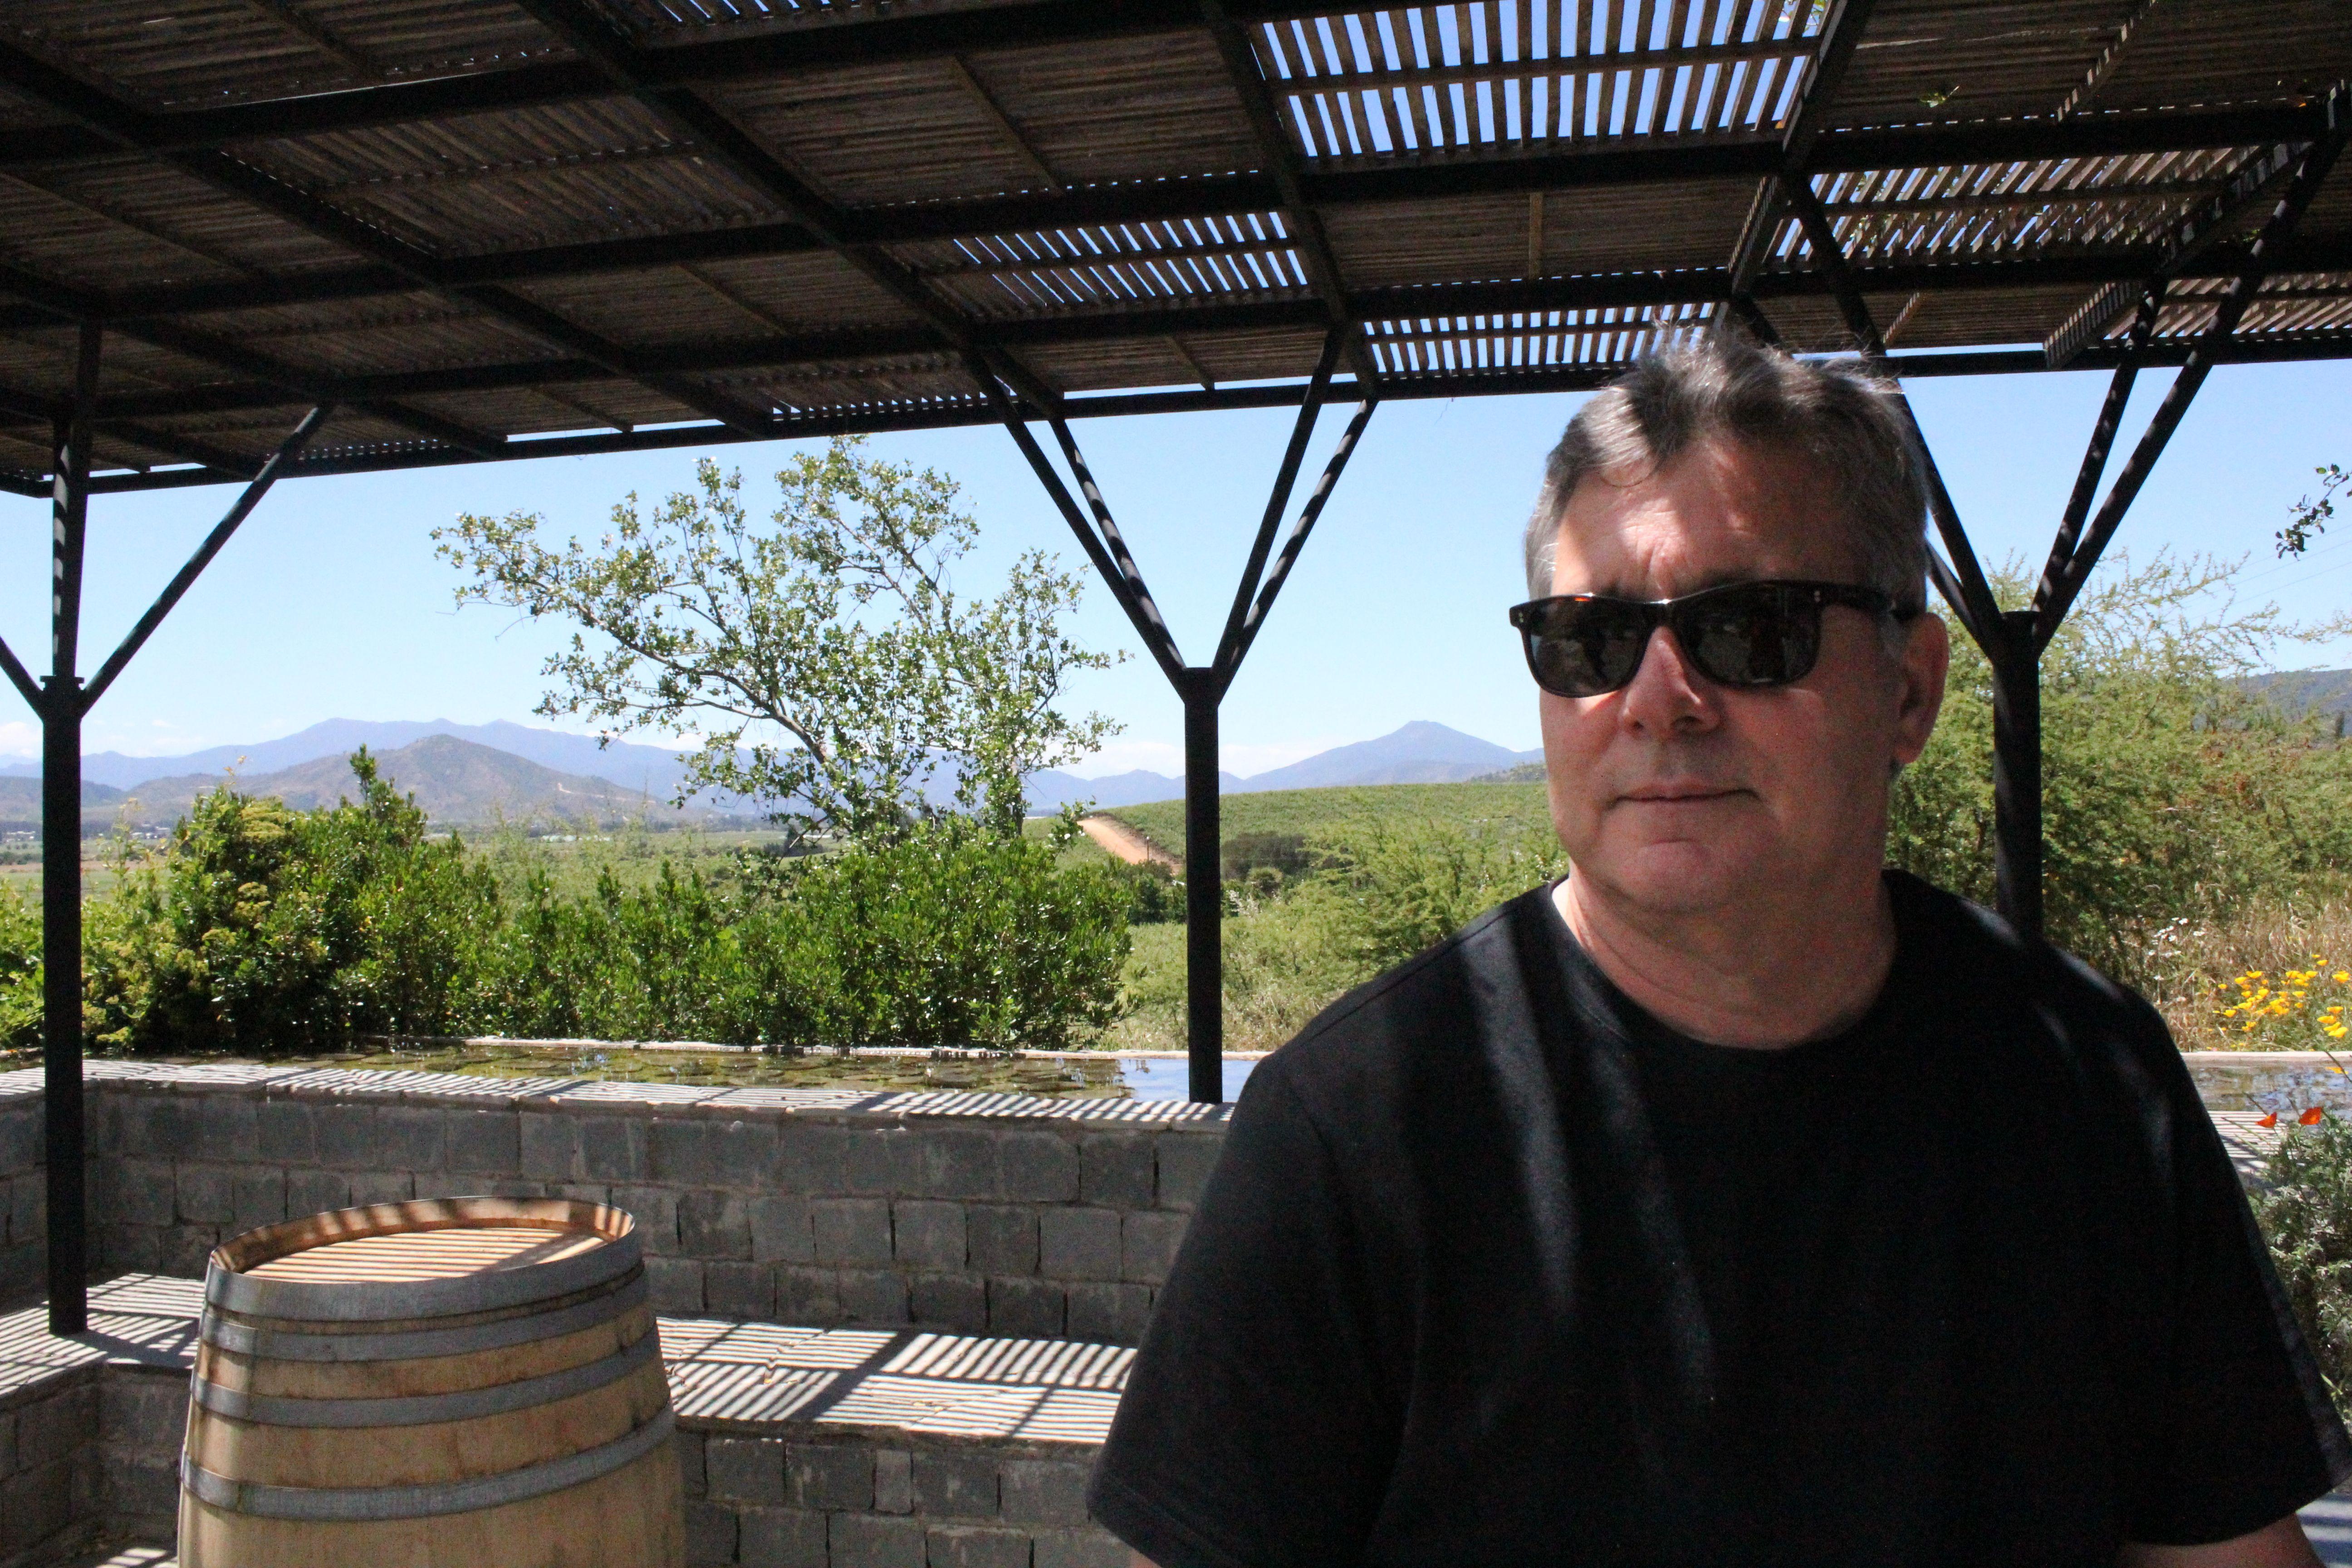 Rex Pickett on Kingston's tasting terraza